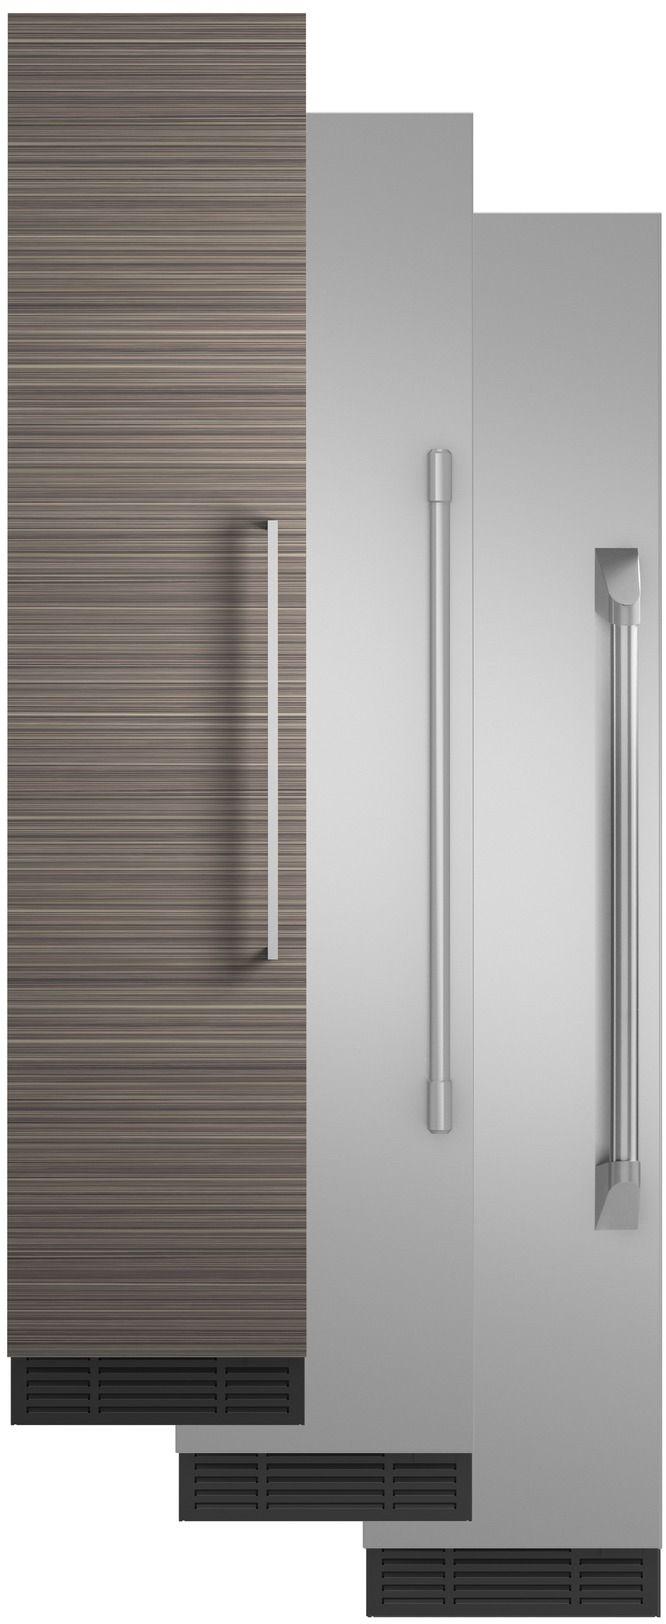 Monogram® 8.4 Cu. Ft. Built-In Column Freezer-Panel Ready-